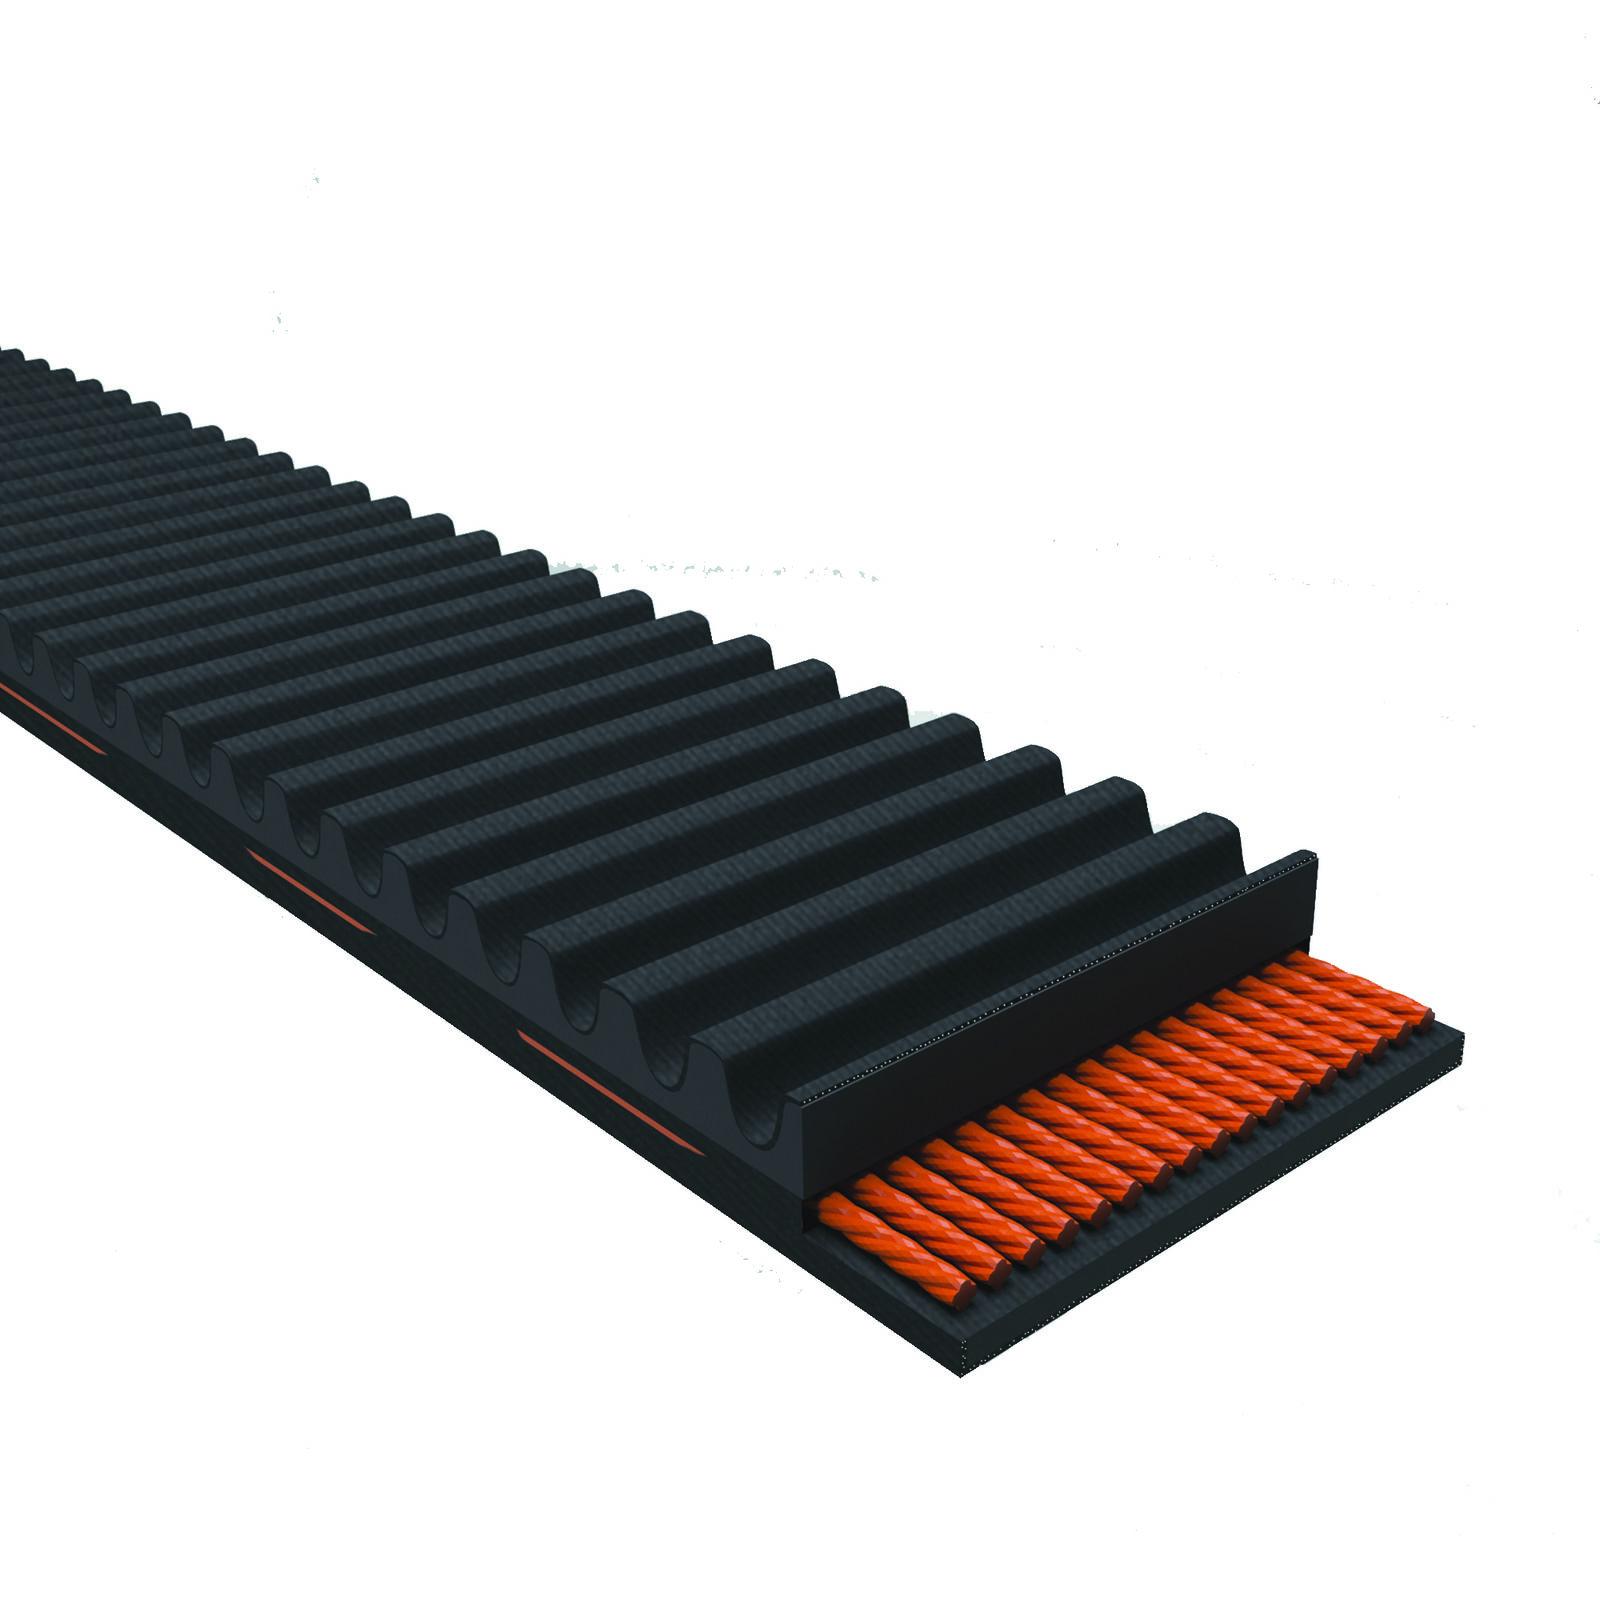 D/&D PowerDrive 2626V293 Variable Speed Belt